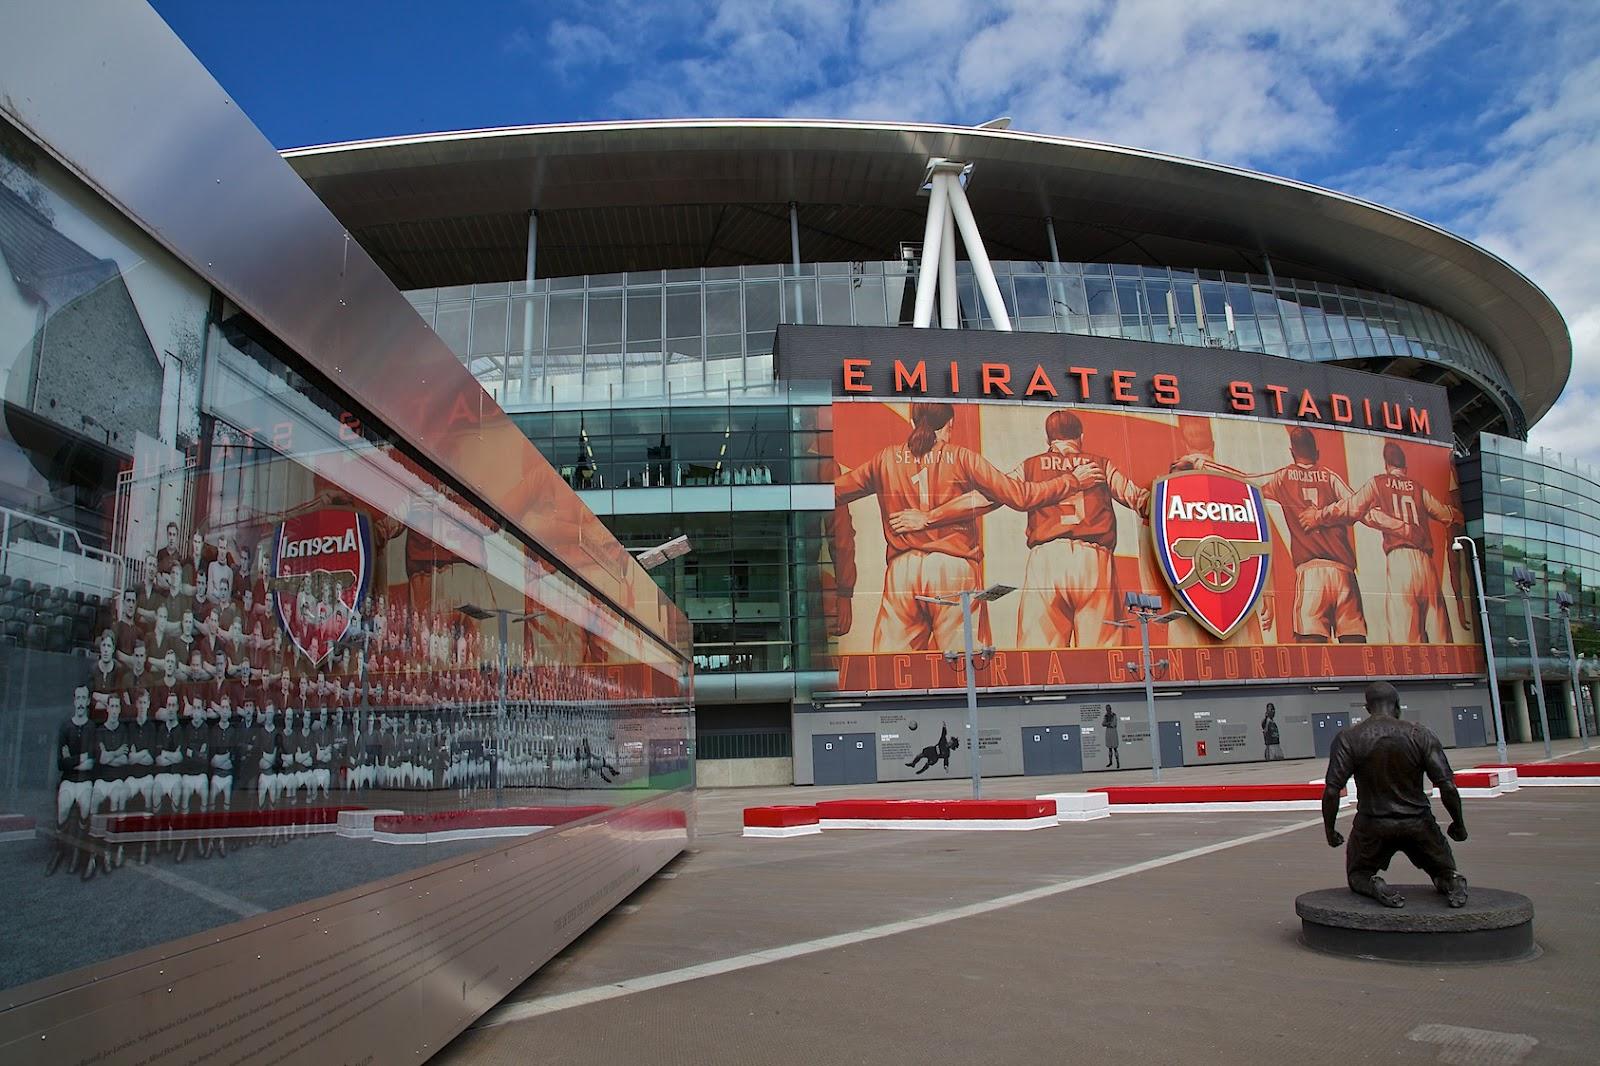 Emirates Wallpaper Hd Arsenal Emirates Stadium Wallpaper Hd Pixelstalk Net